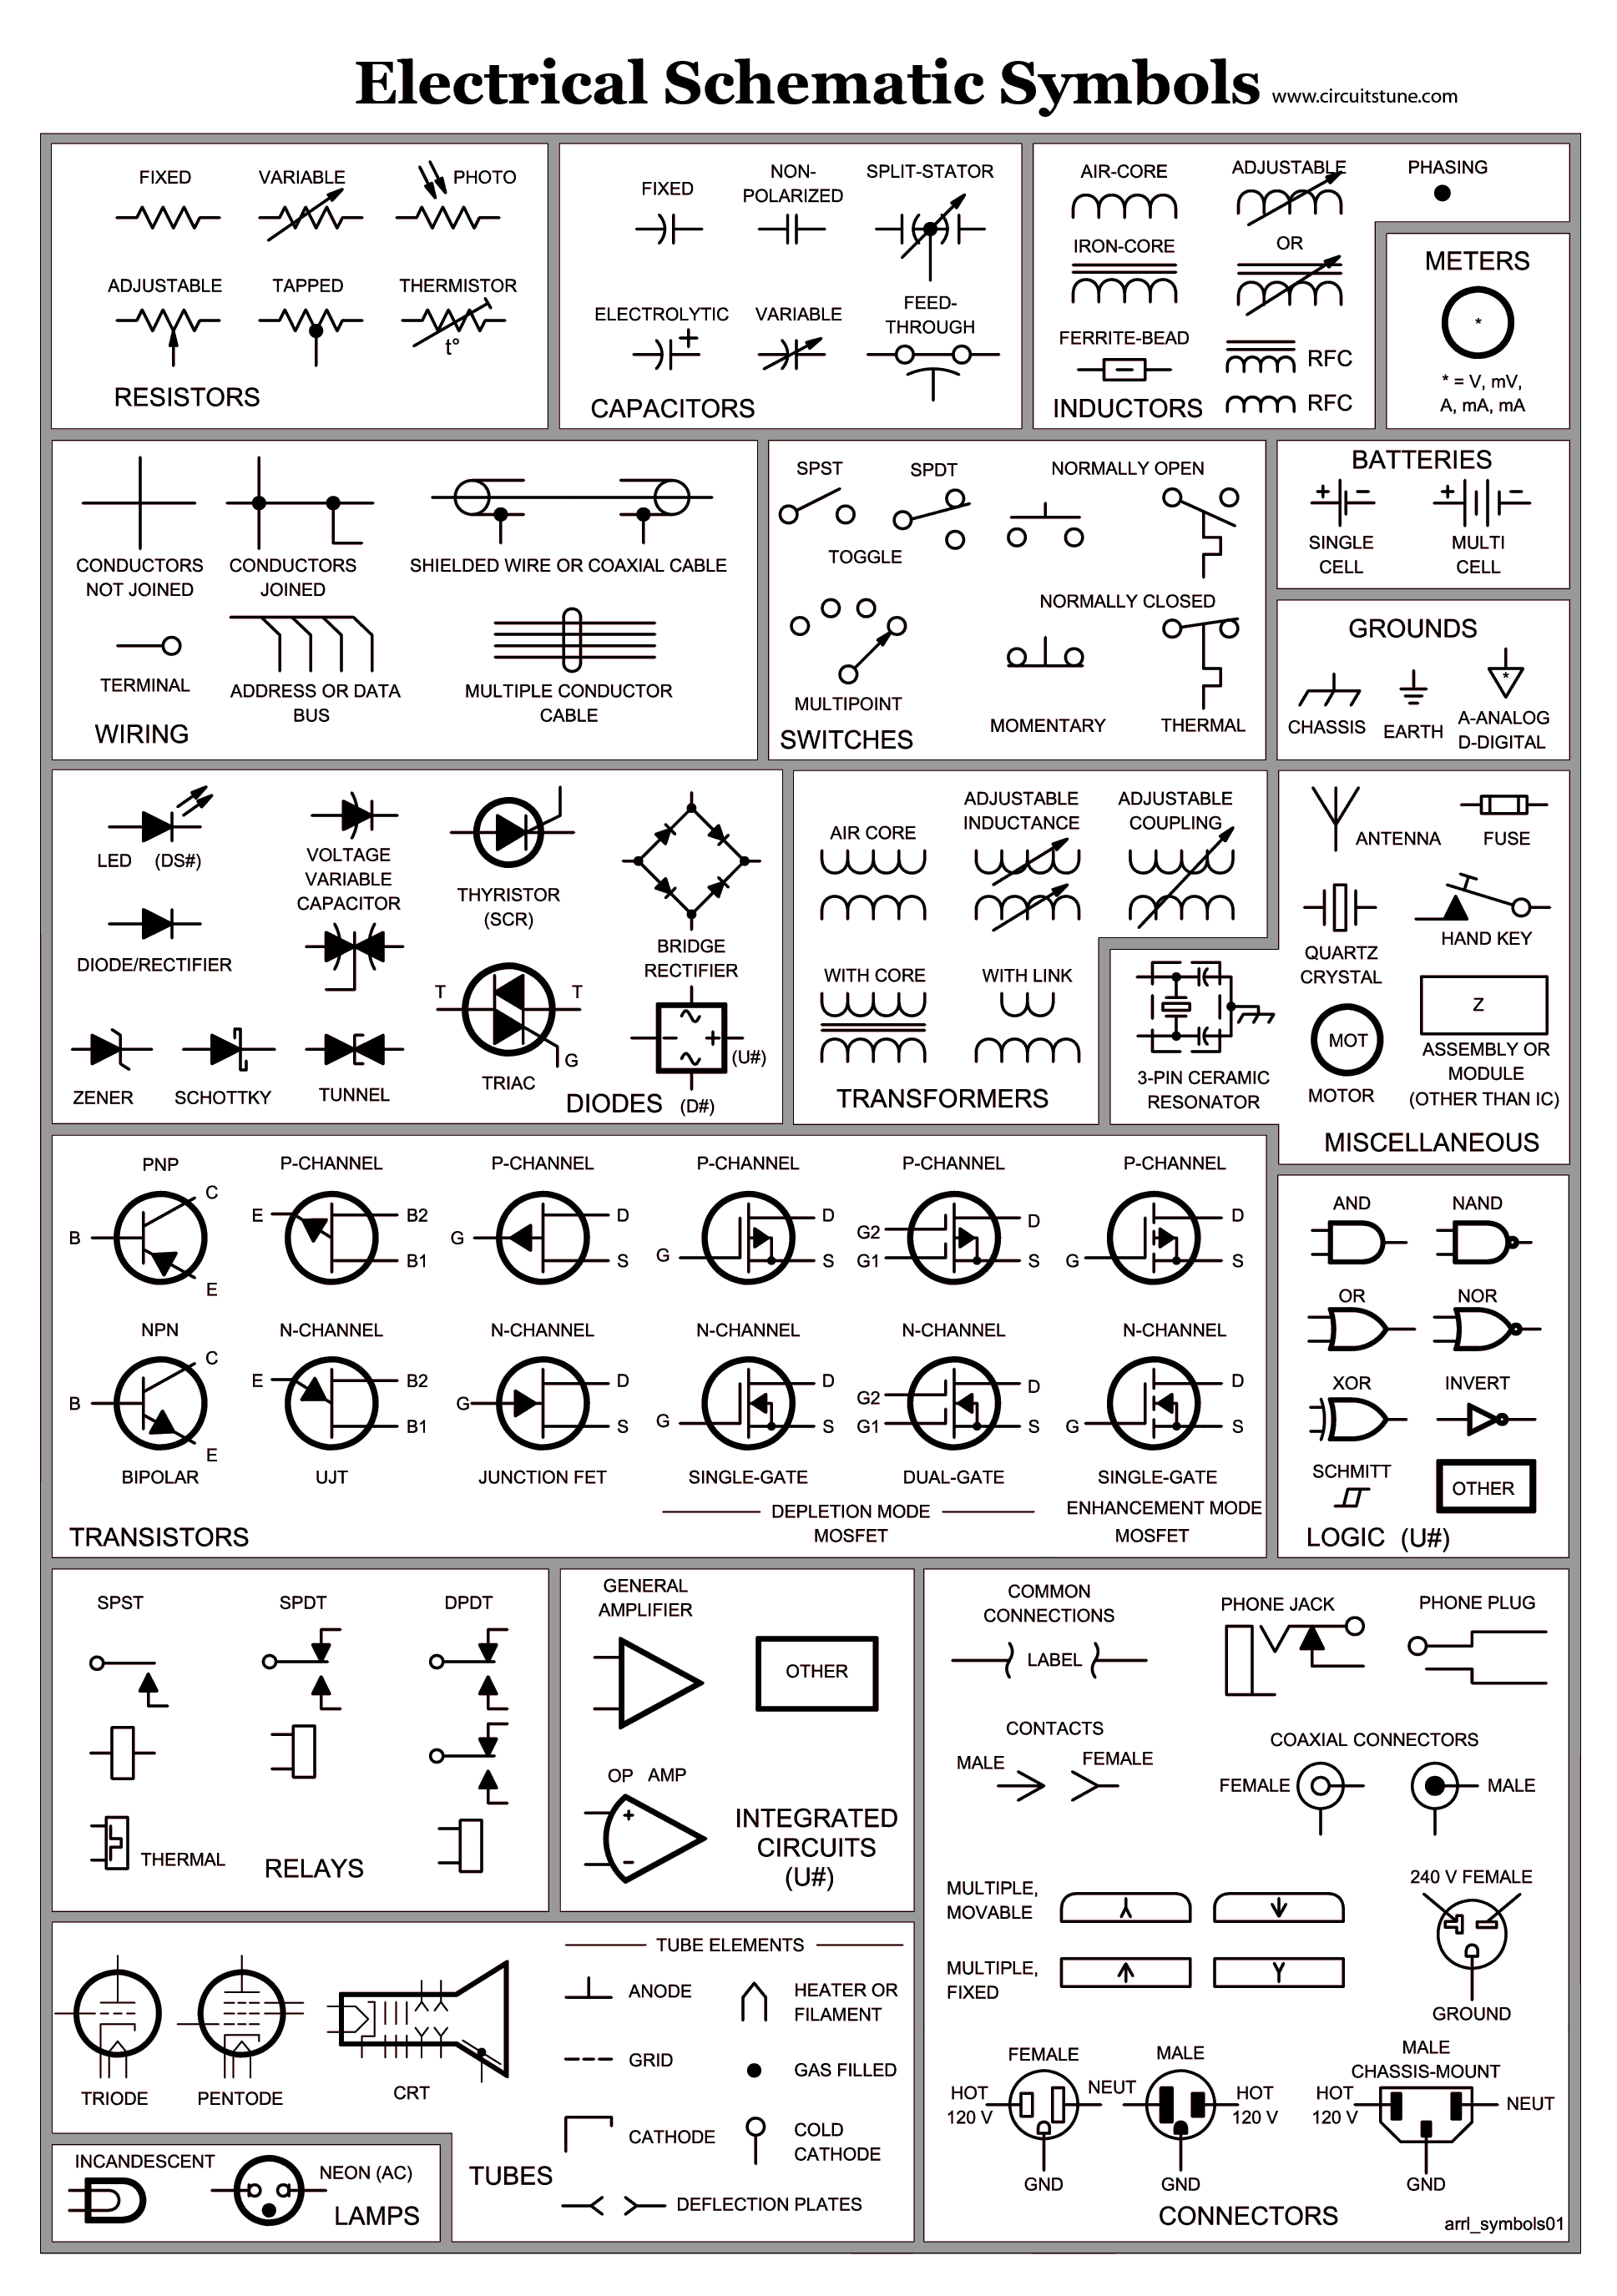 medium resolution of electrical schematic symbols circuitstune schematic diagram symbols atom model electric fan regulator circuit